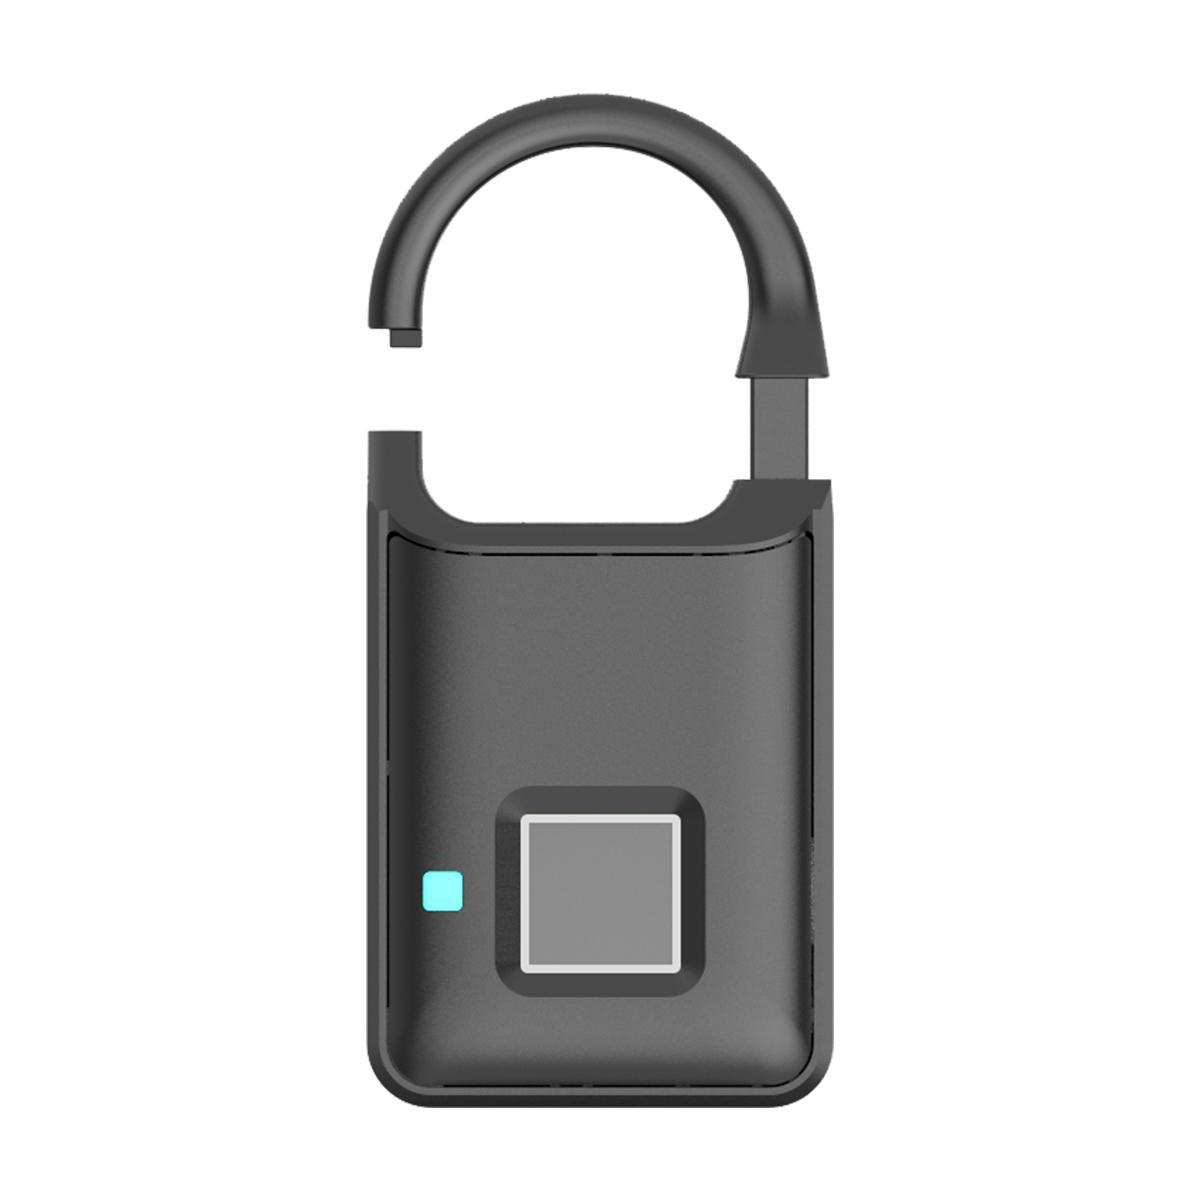 Semiconductor Sensor Small Fingerprint Padlock With USB Charger  5